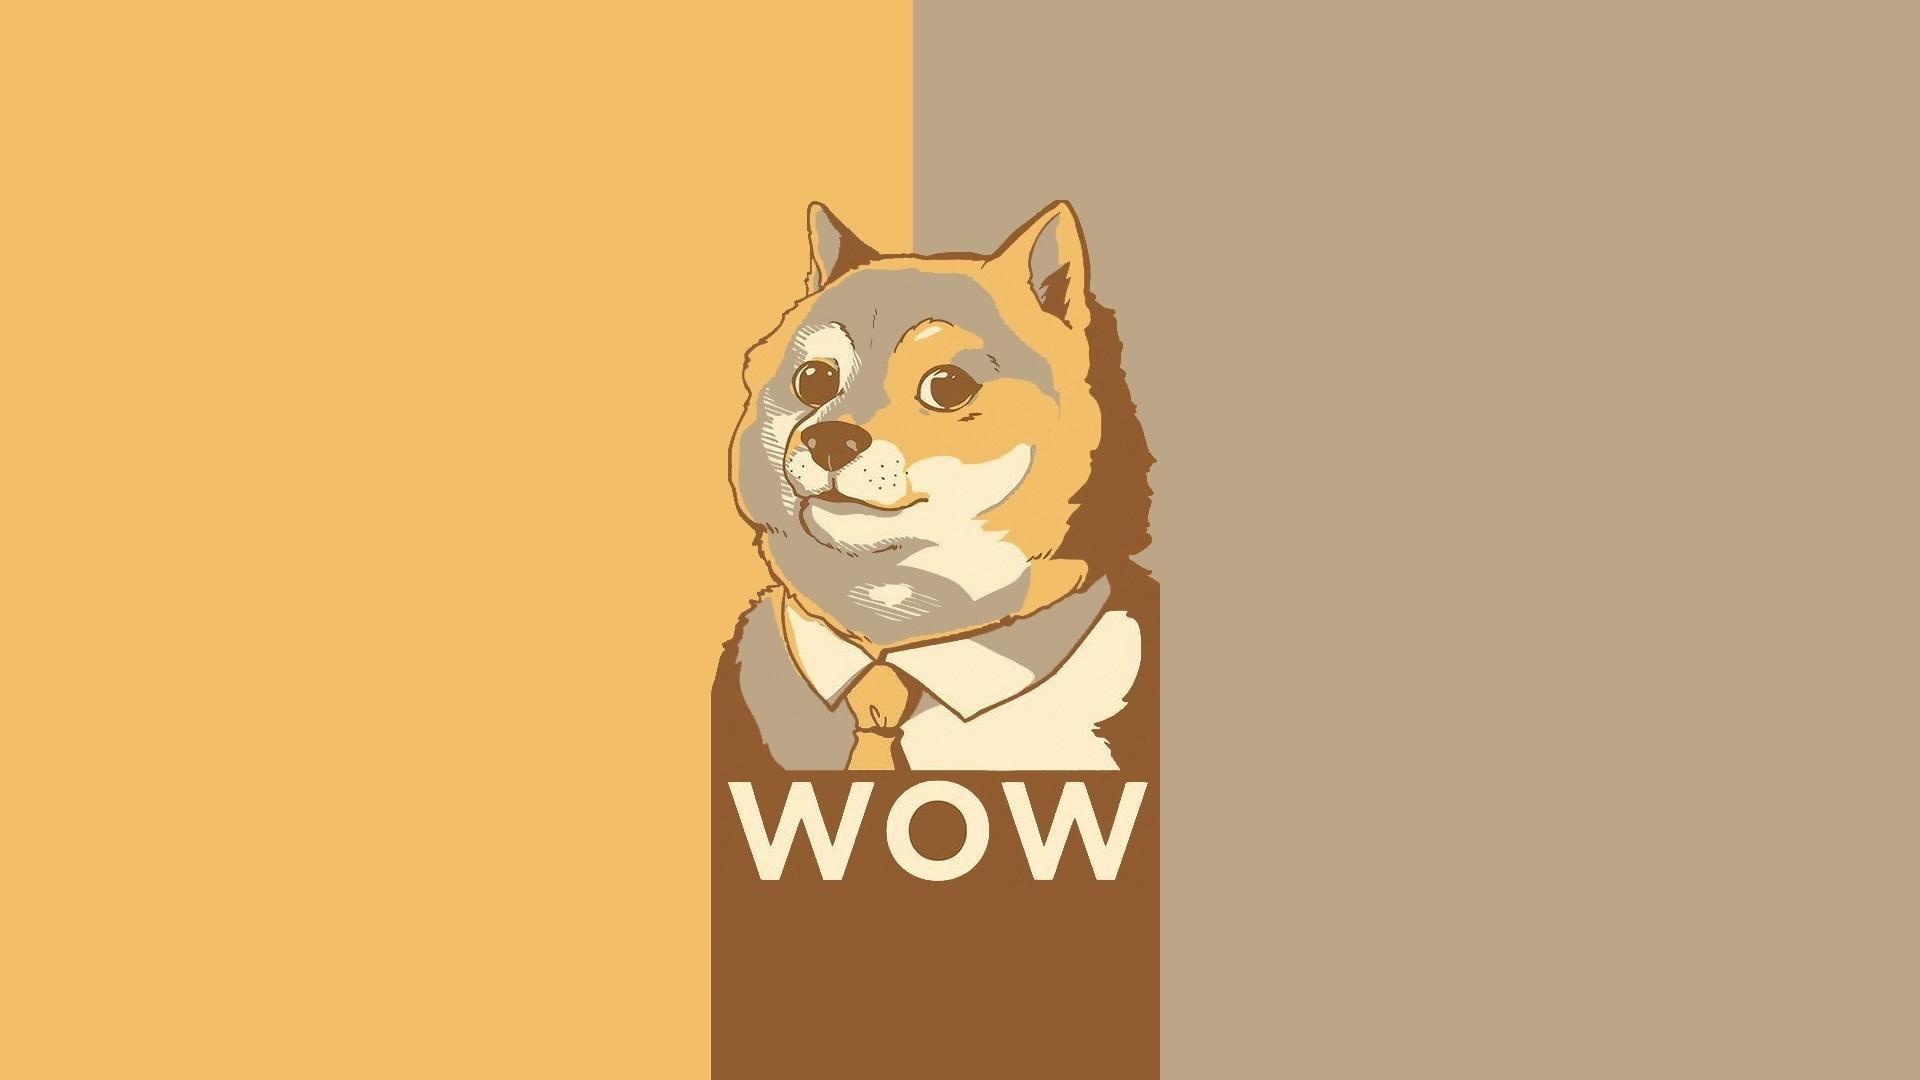 Doge Meme laptop wallpaper